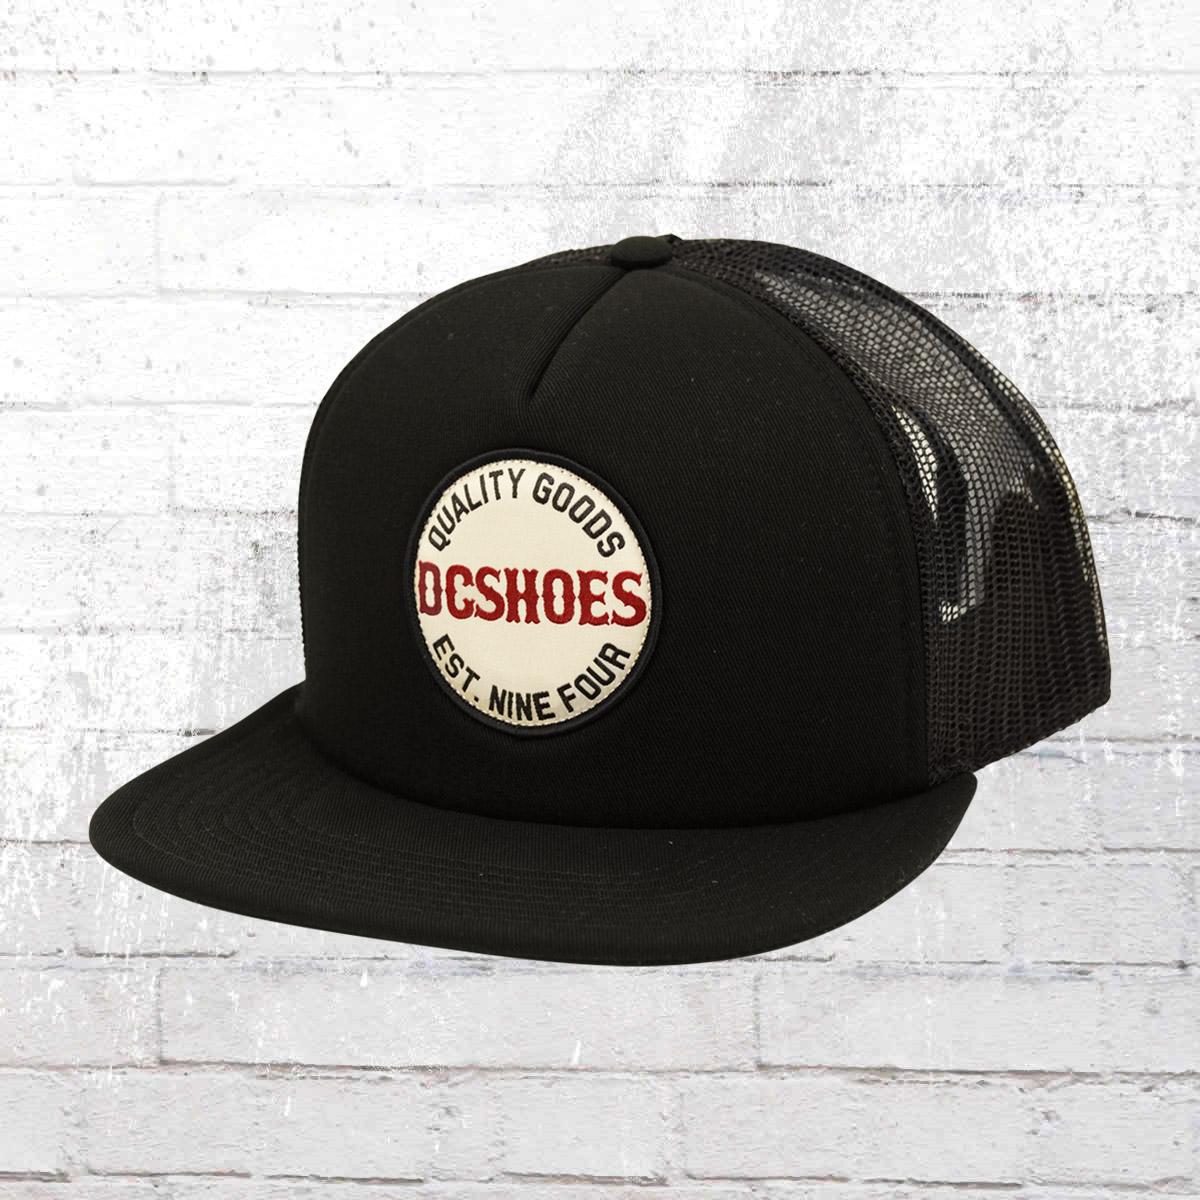 DC Shoes Snapback Trucker Hat Toolshead Cap black. ›‹ « 01ffddc0597b